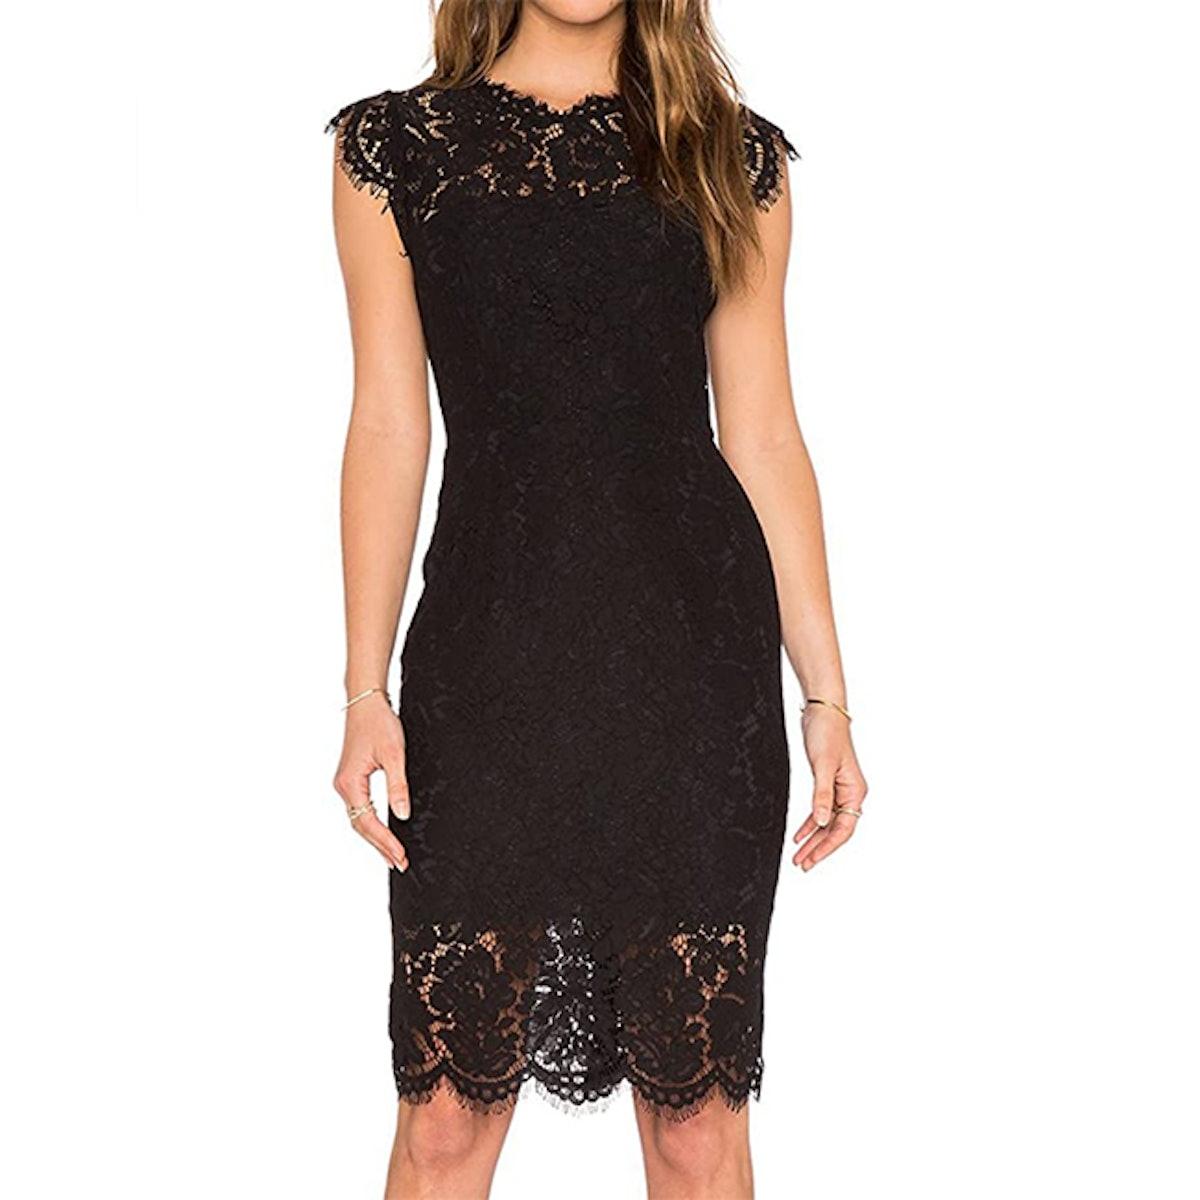 MEROKEETY Sleeveless Lace Knee Length Dress